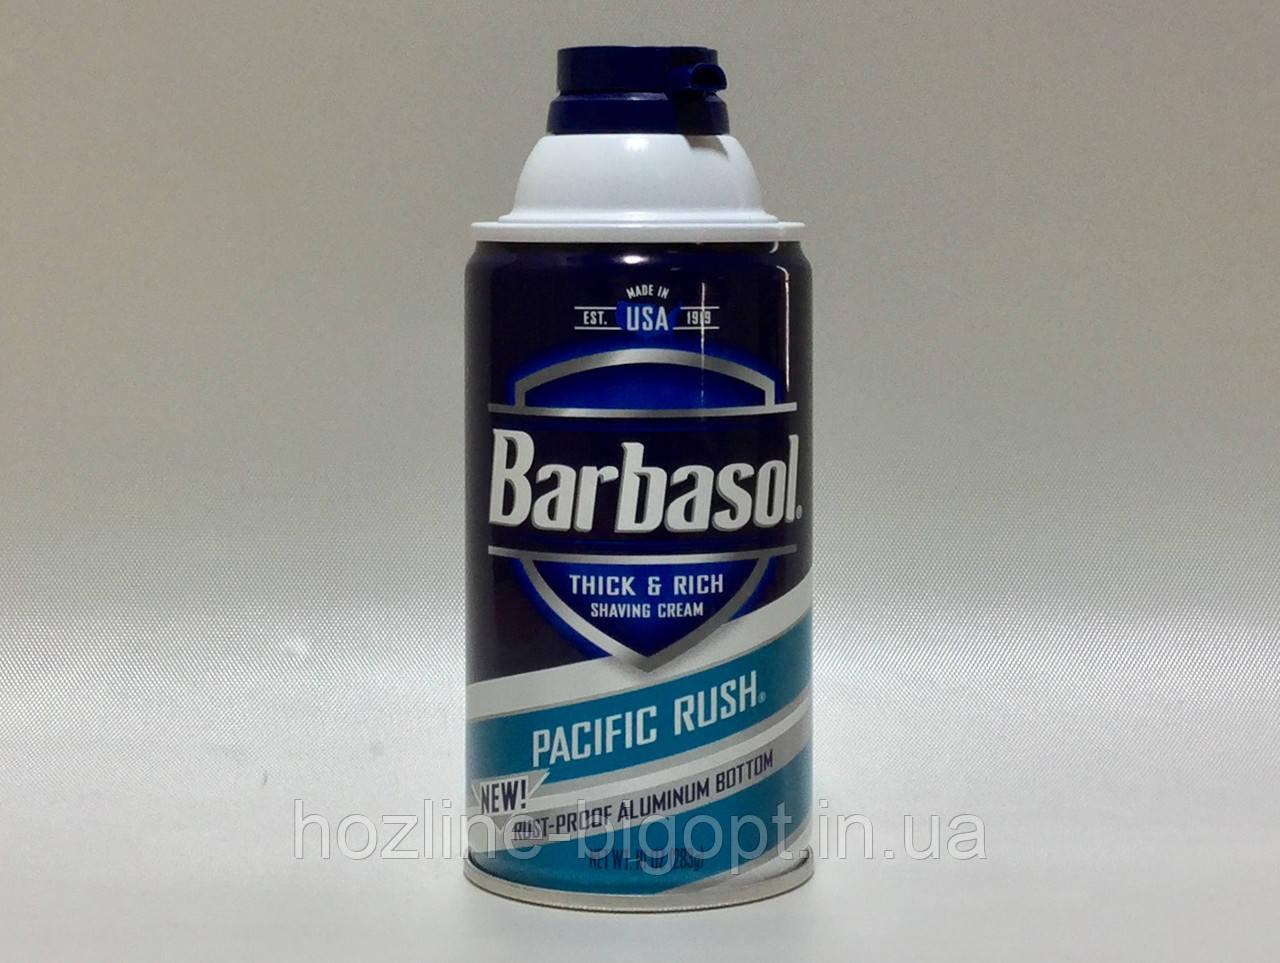 Barbasol Пена для бритья Pacific Rush 283 гр.